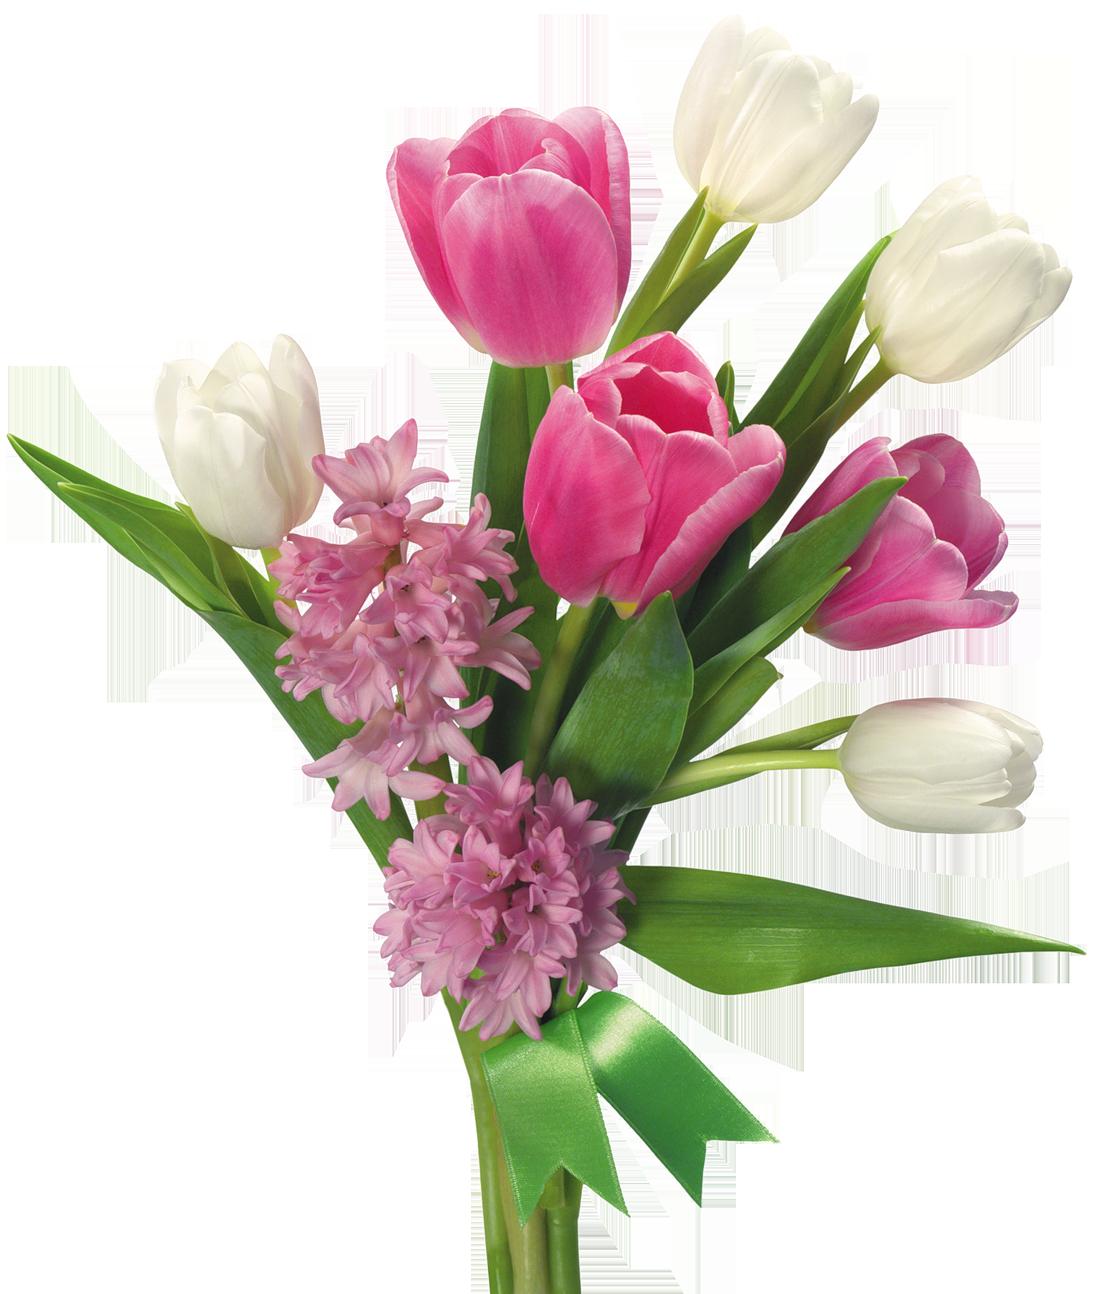 Flower HD PNG - 137388